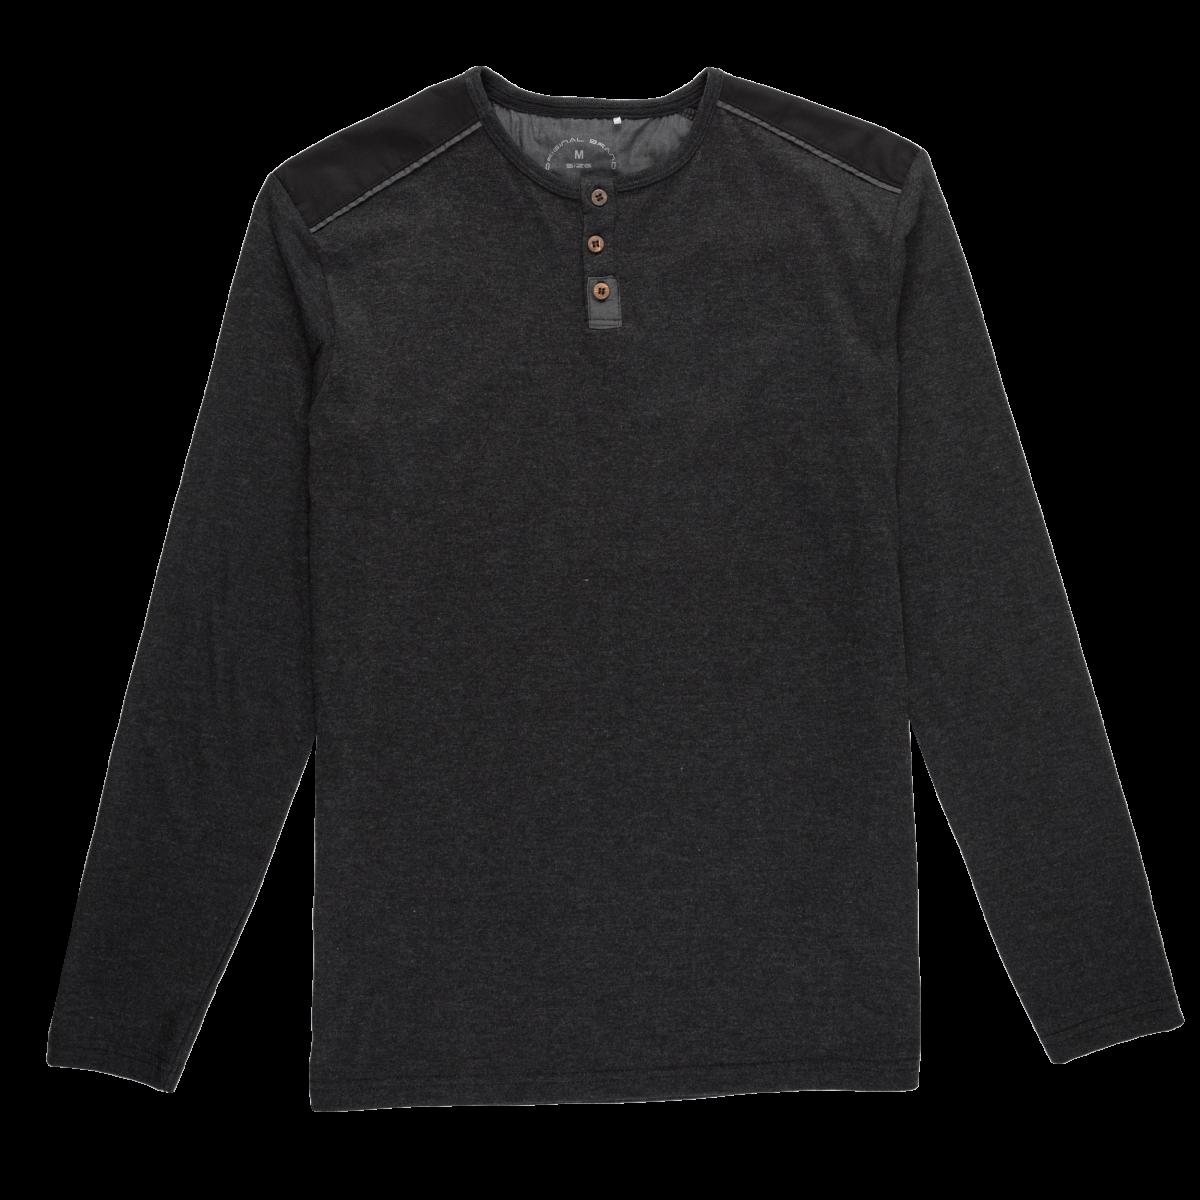 Moška majica, črna